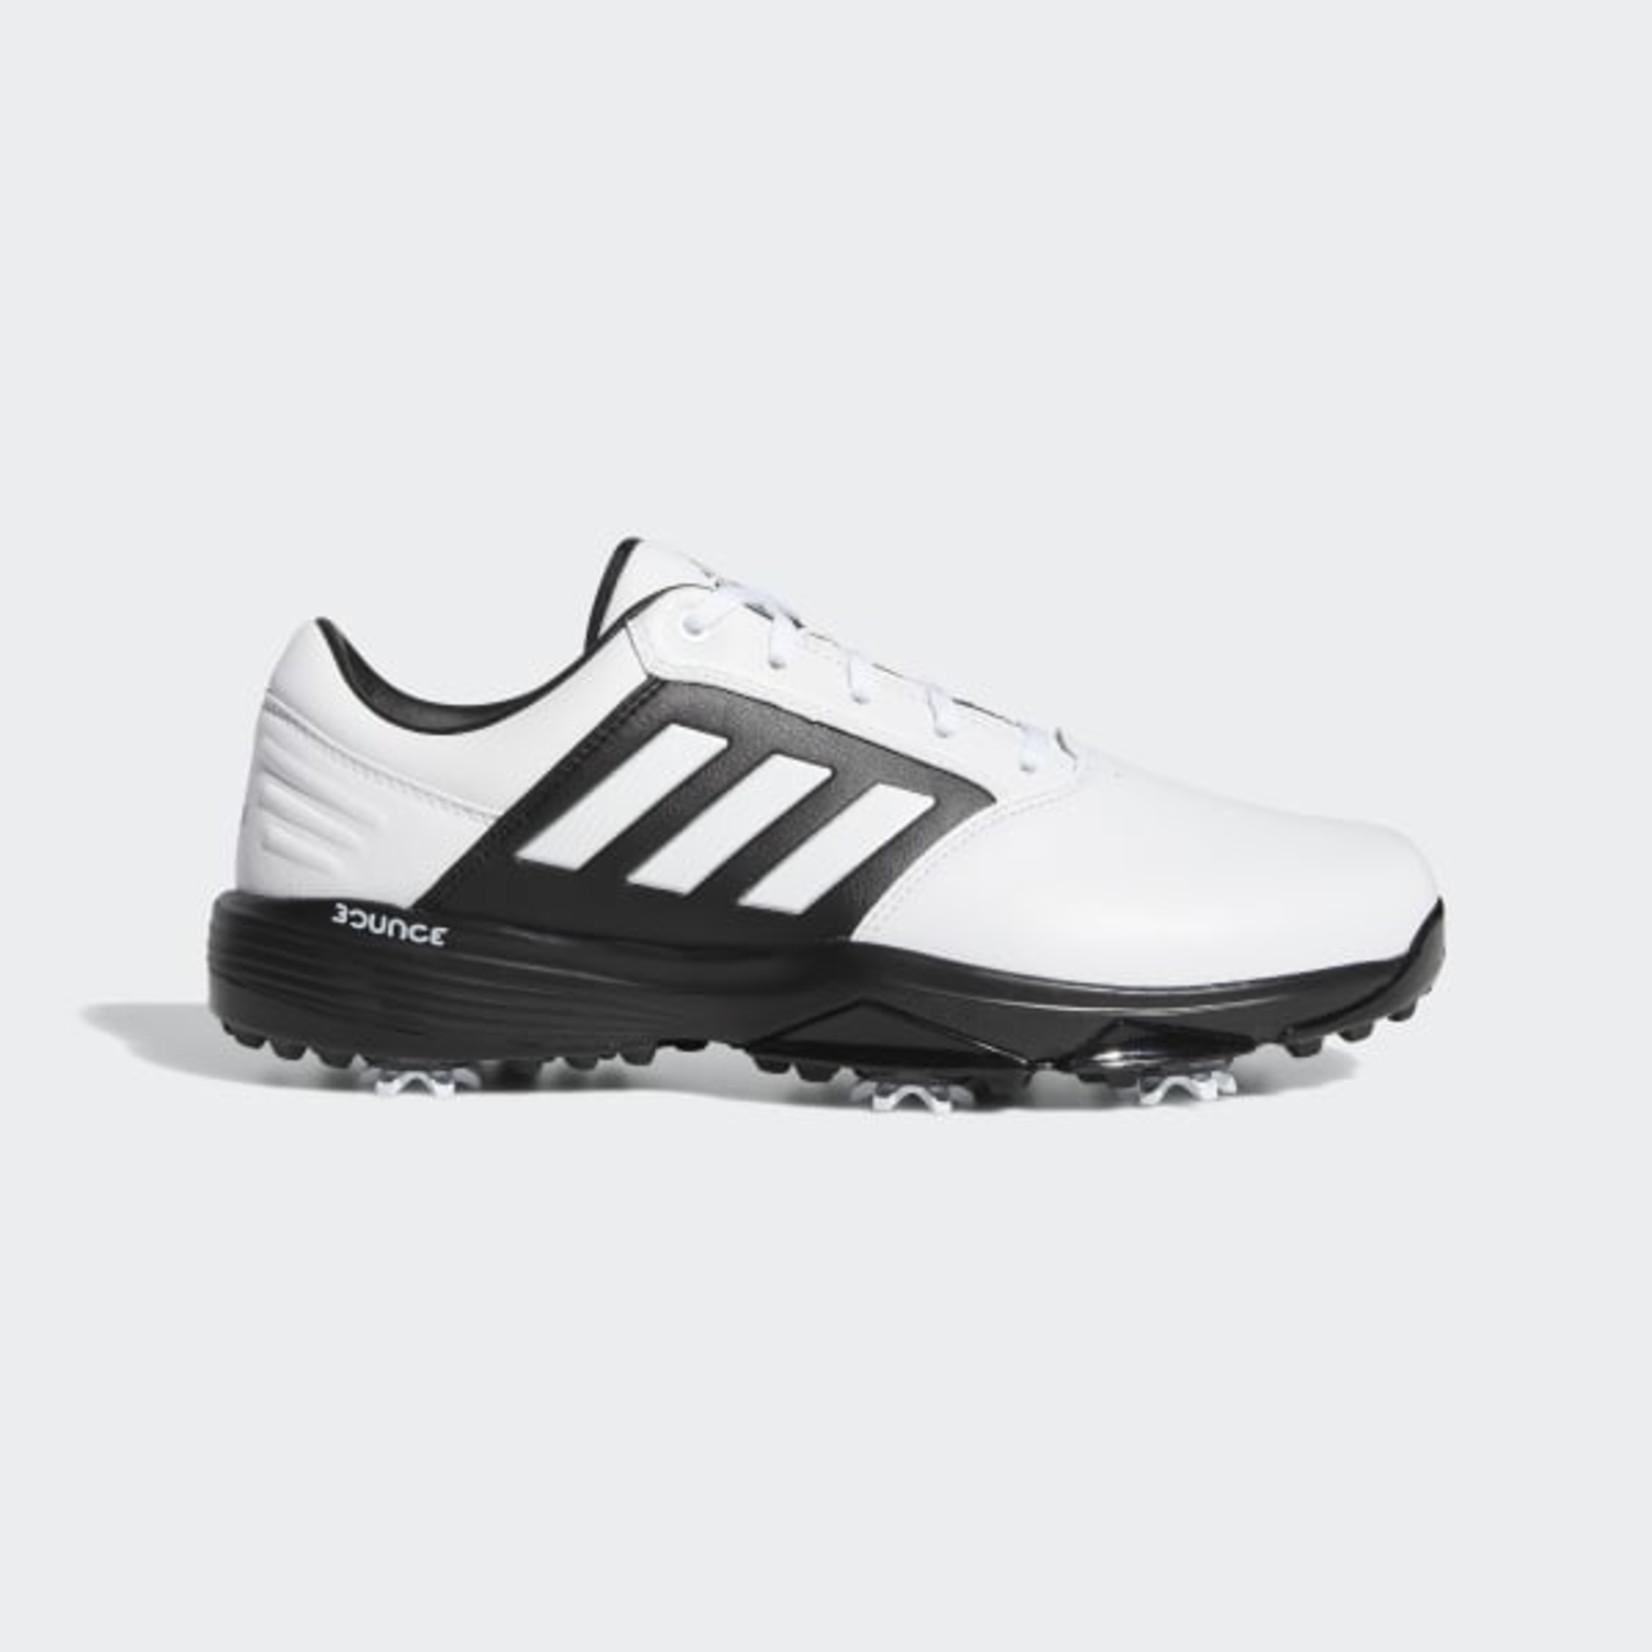 Adidas Adidas21 Men's 360 Bounce II Shoe-Spiked